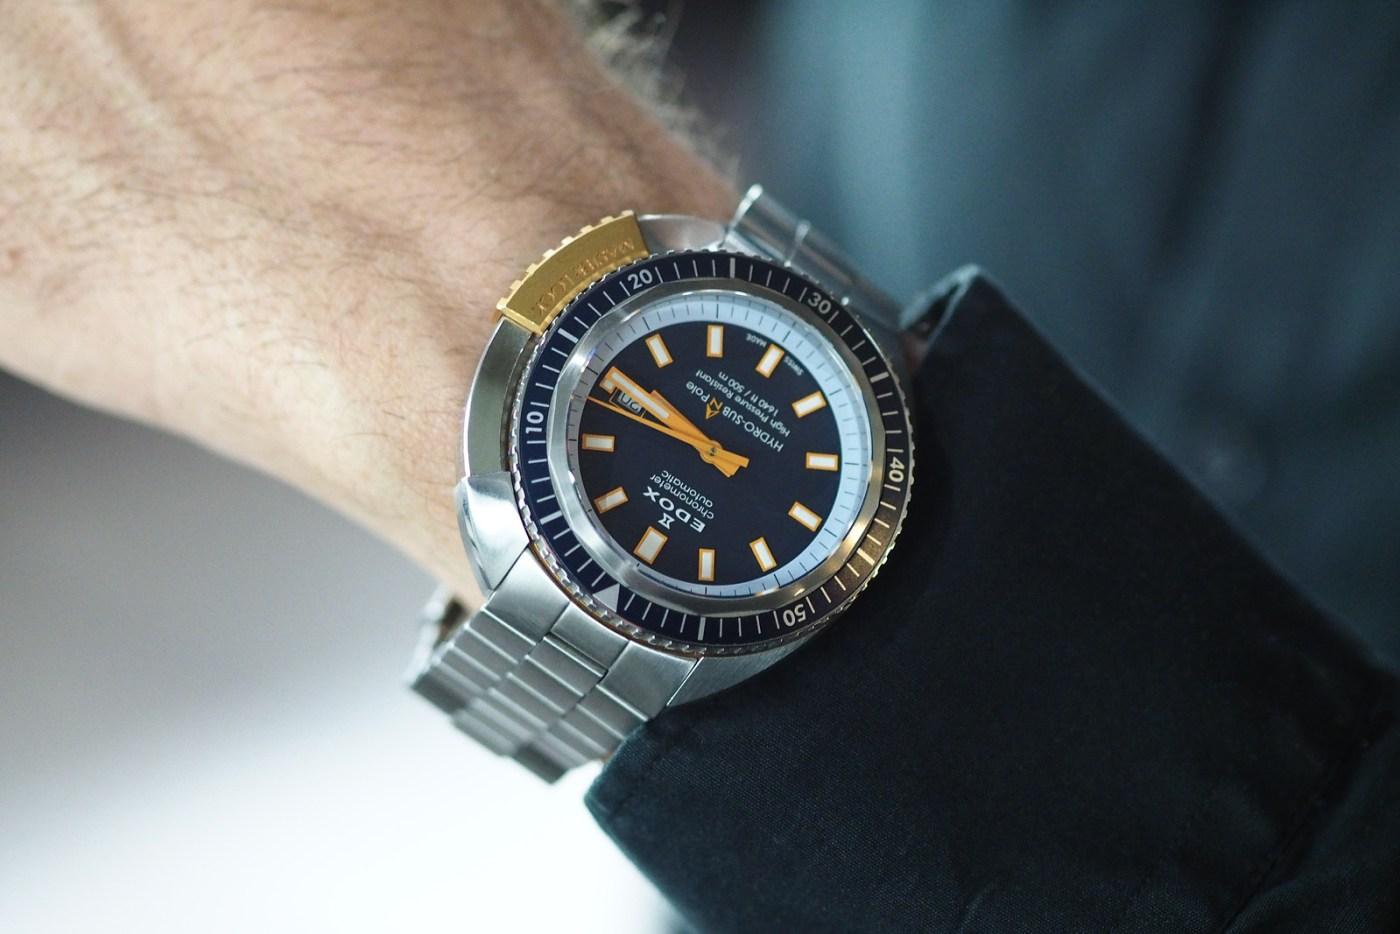 Christian Redl wearing the Edox HydroSub Automatic - $1,795